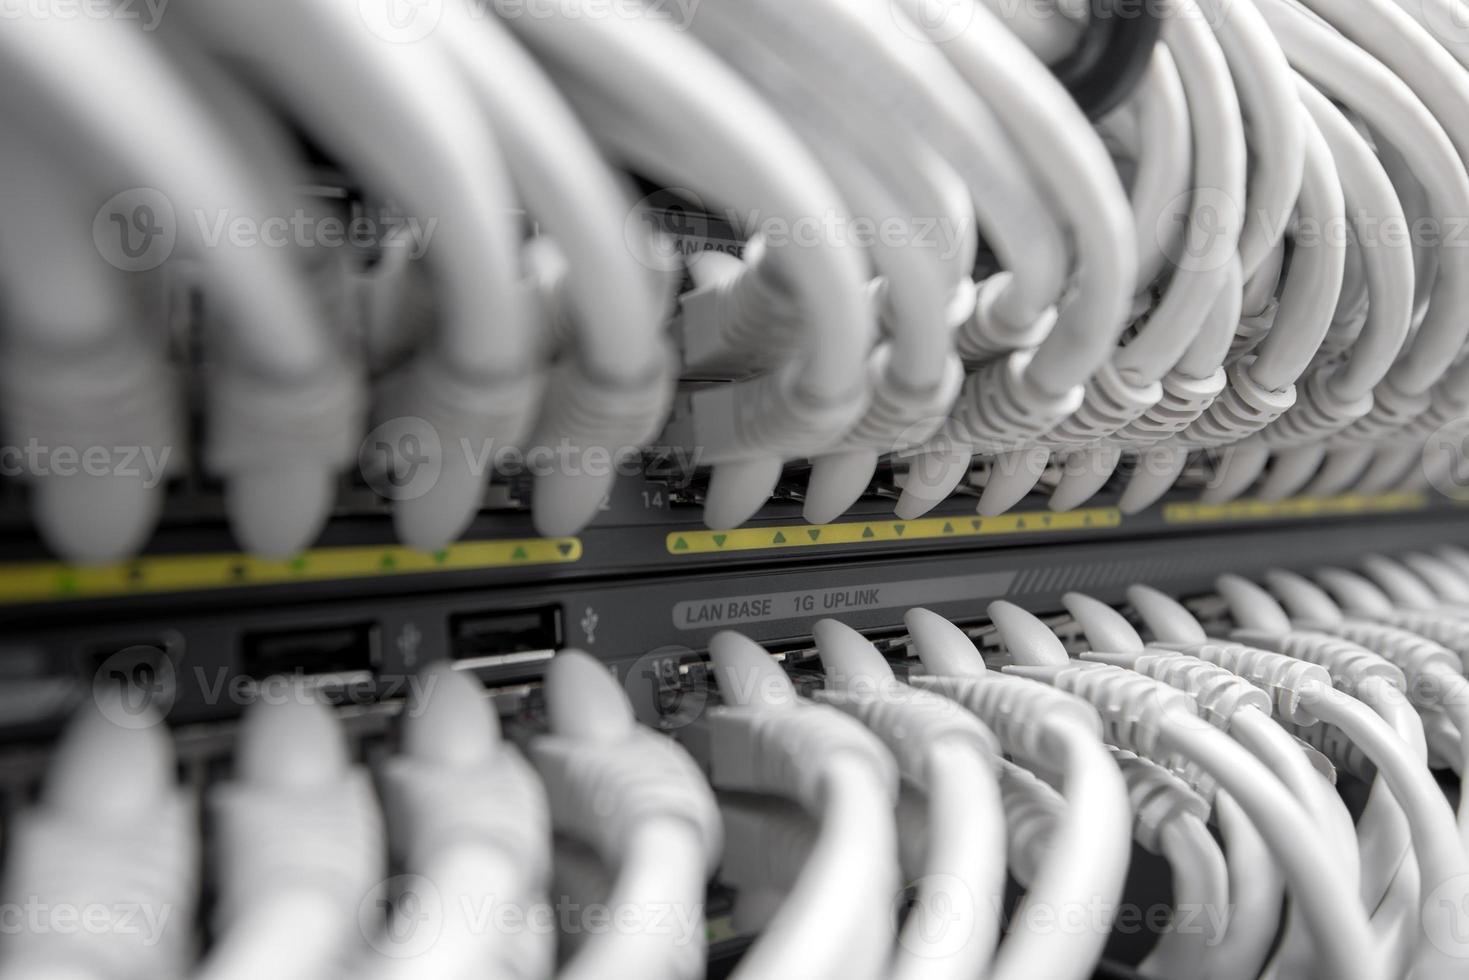 comutador inteligente de rede gigabit com cabos conectados foto